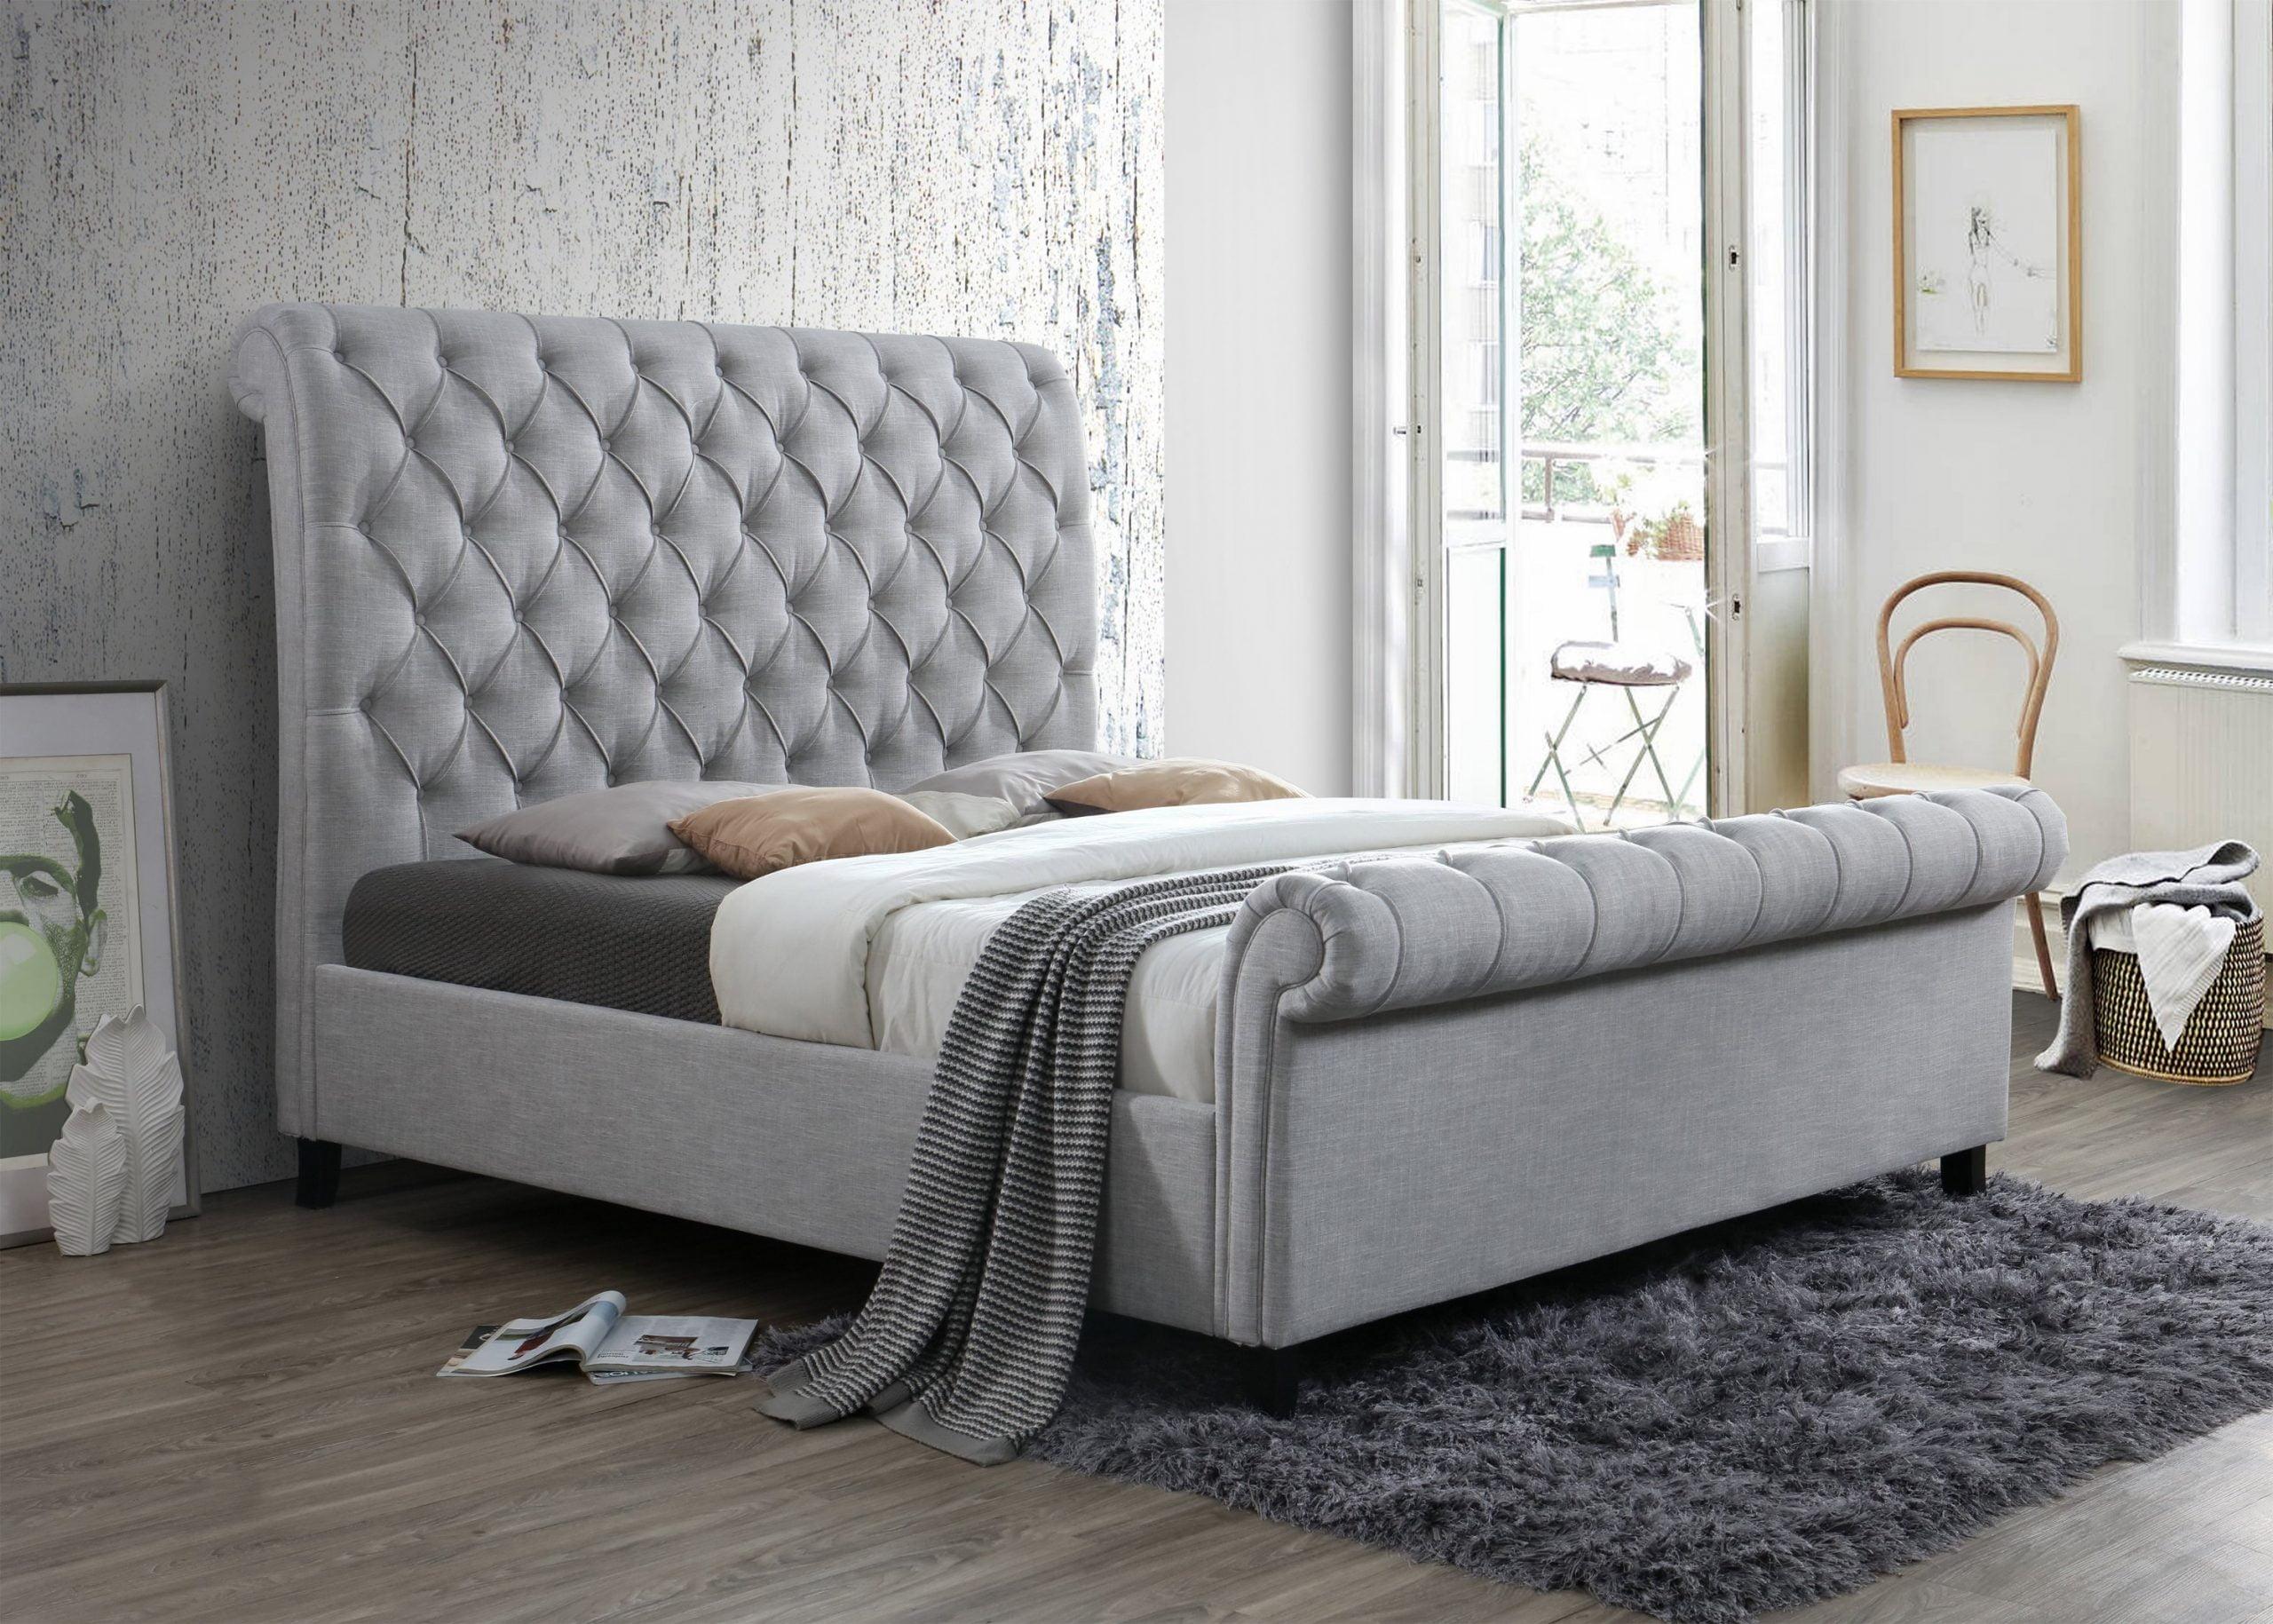 Wood Vs. Upholstered Bed